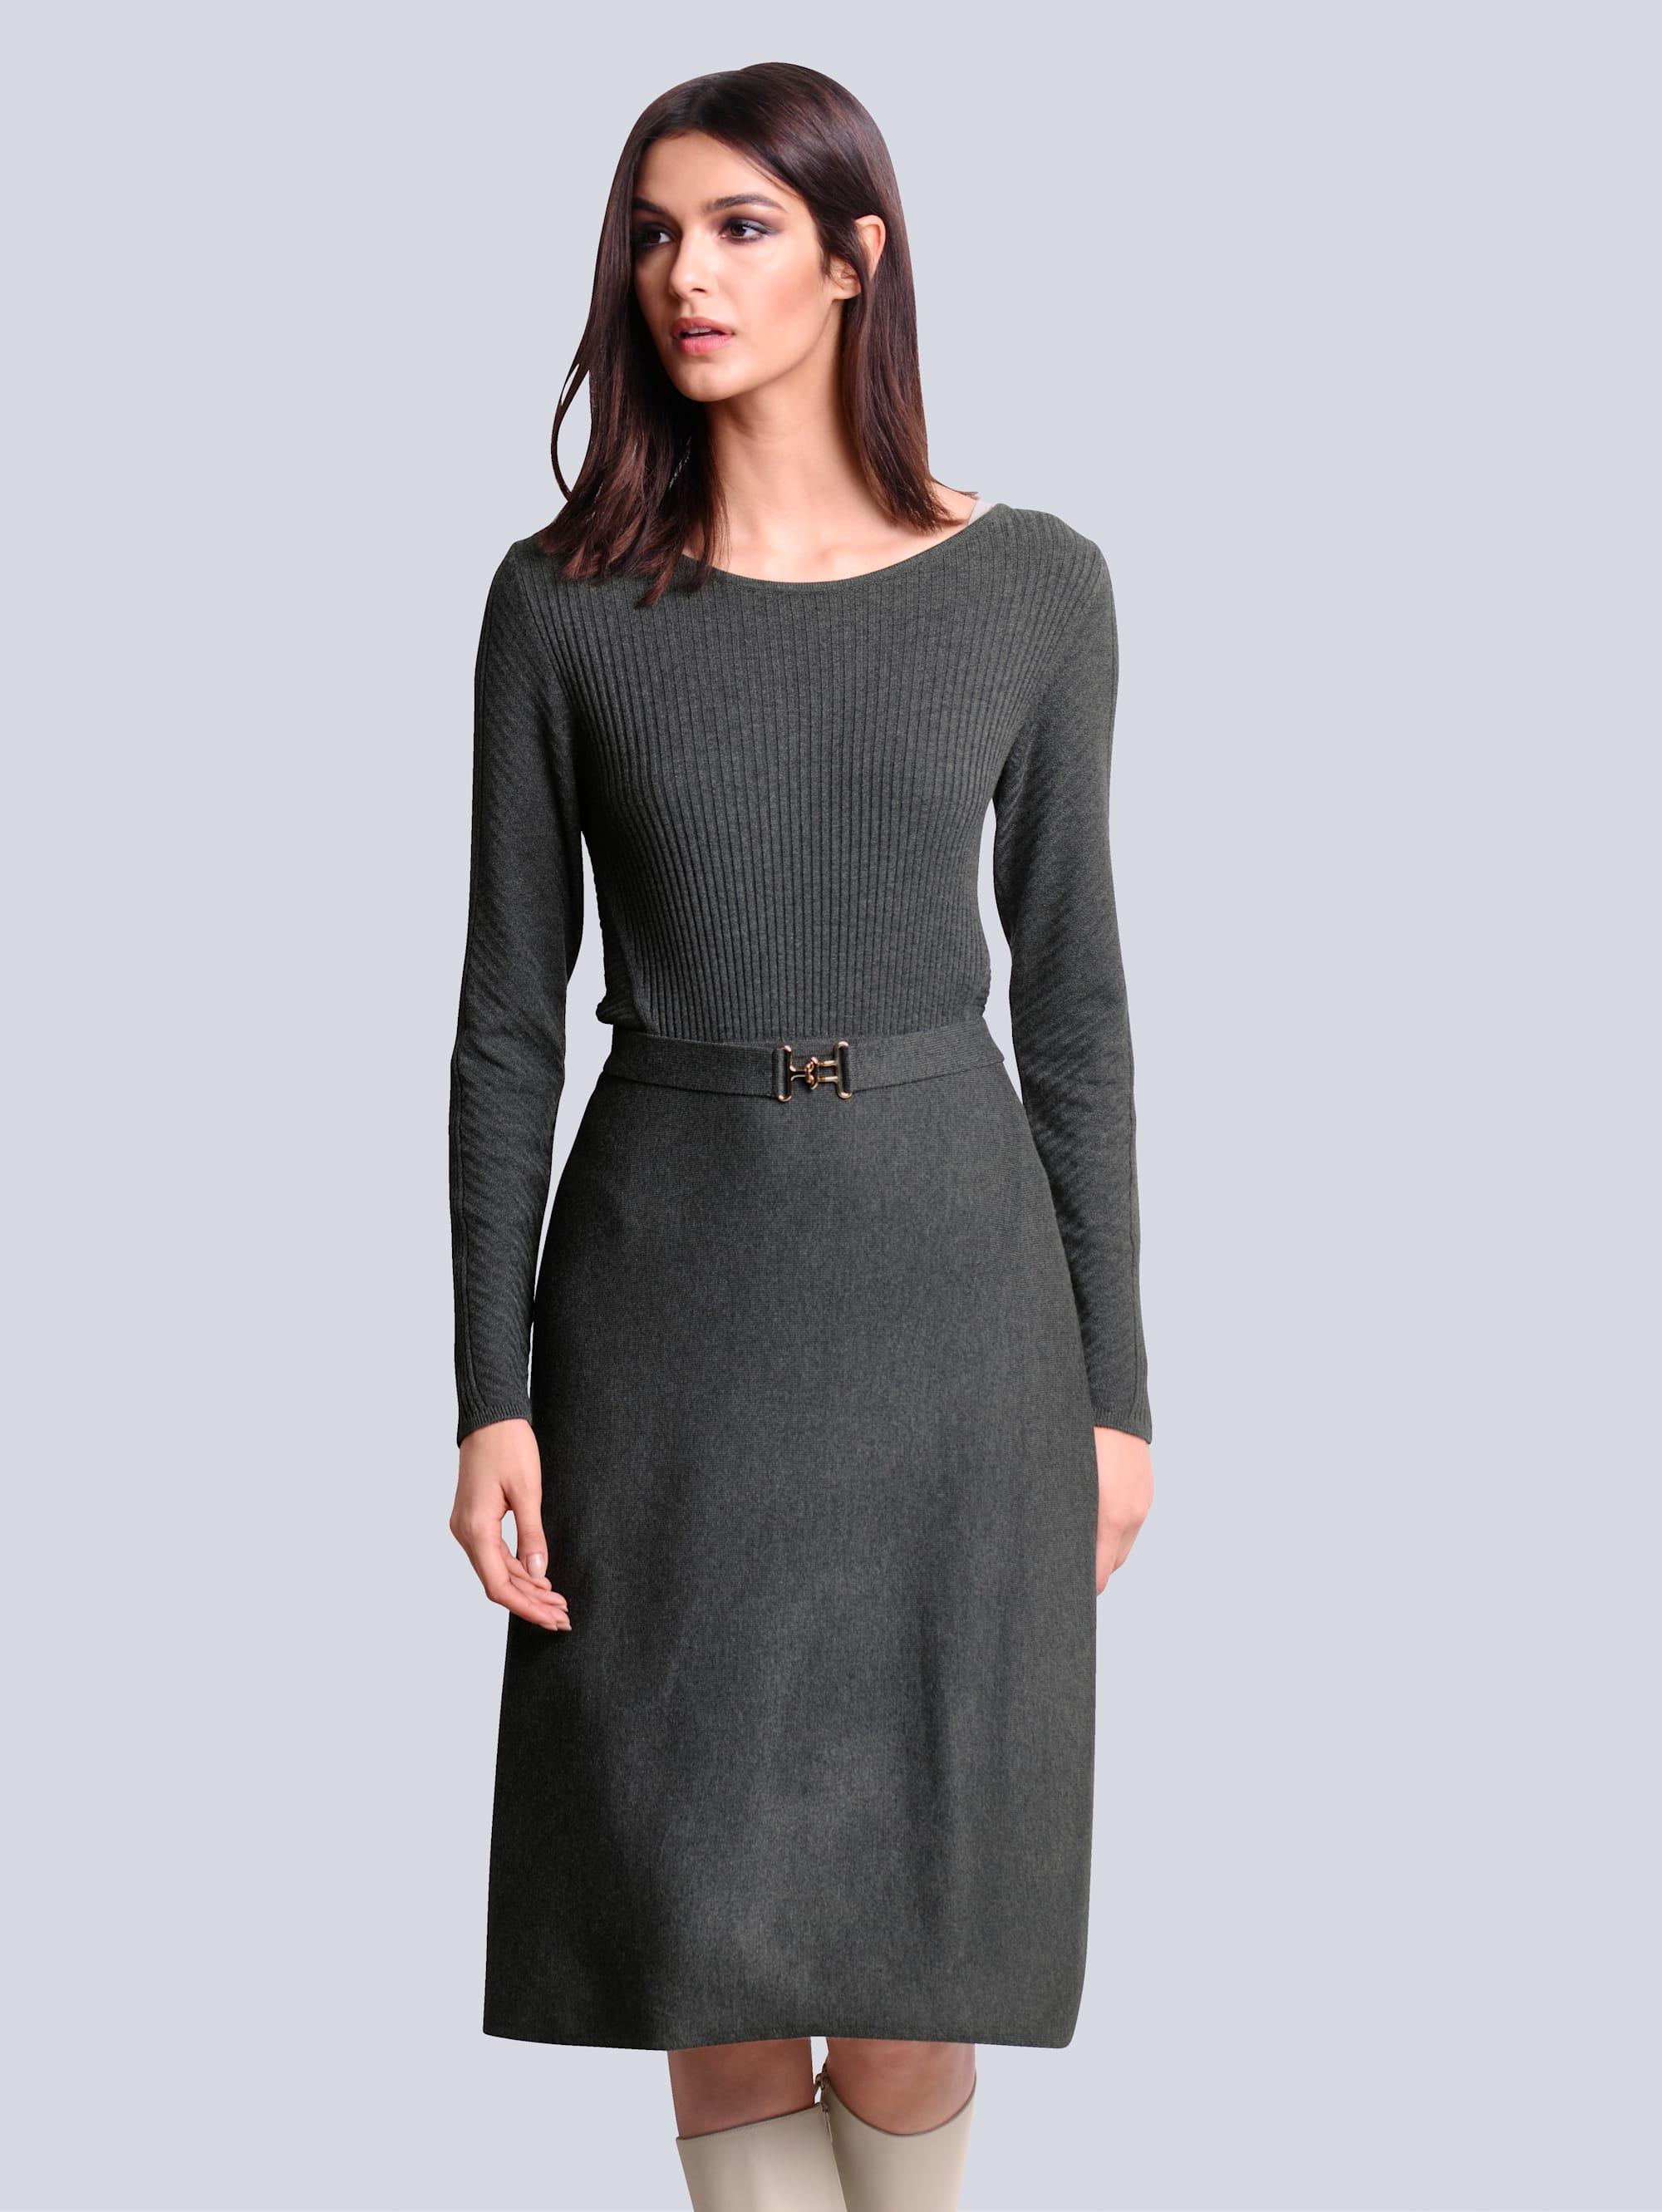 alba moda -  Strickkleid, mit Bindegürtel